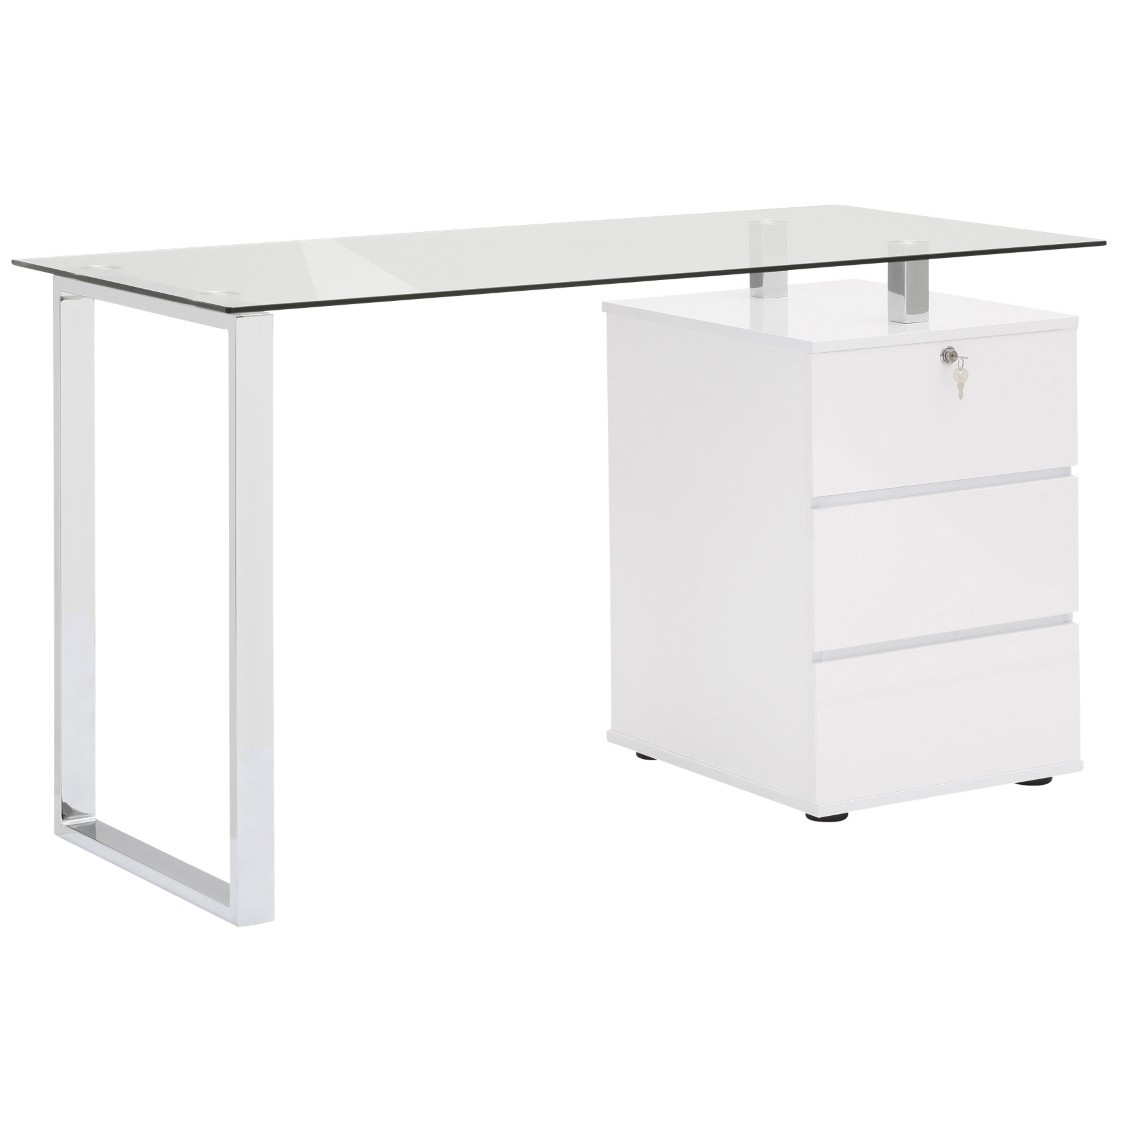 Computertisch 9550 | Metall Chrom / Weiß Hochglanz